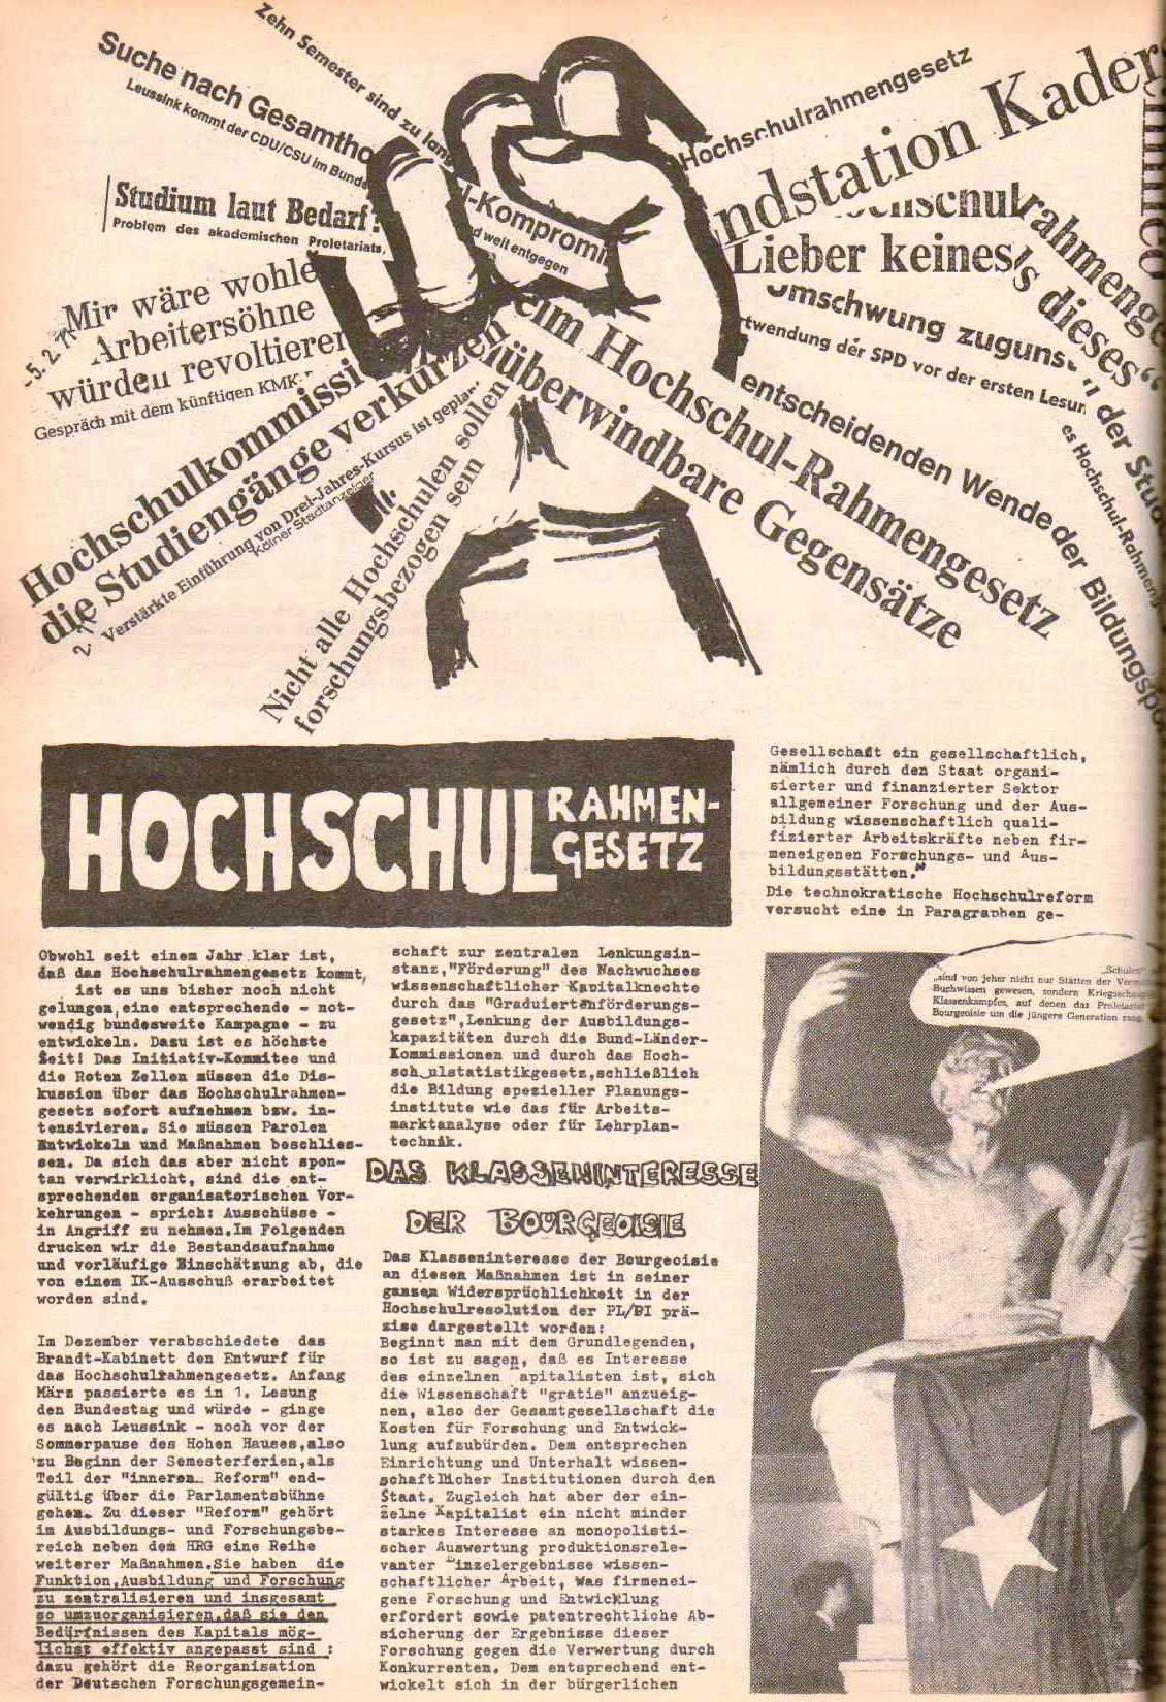 Berlin_Hochschulkampf_1971_04_04